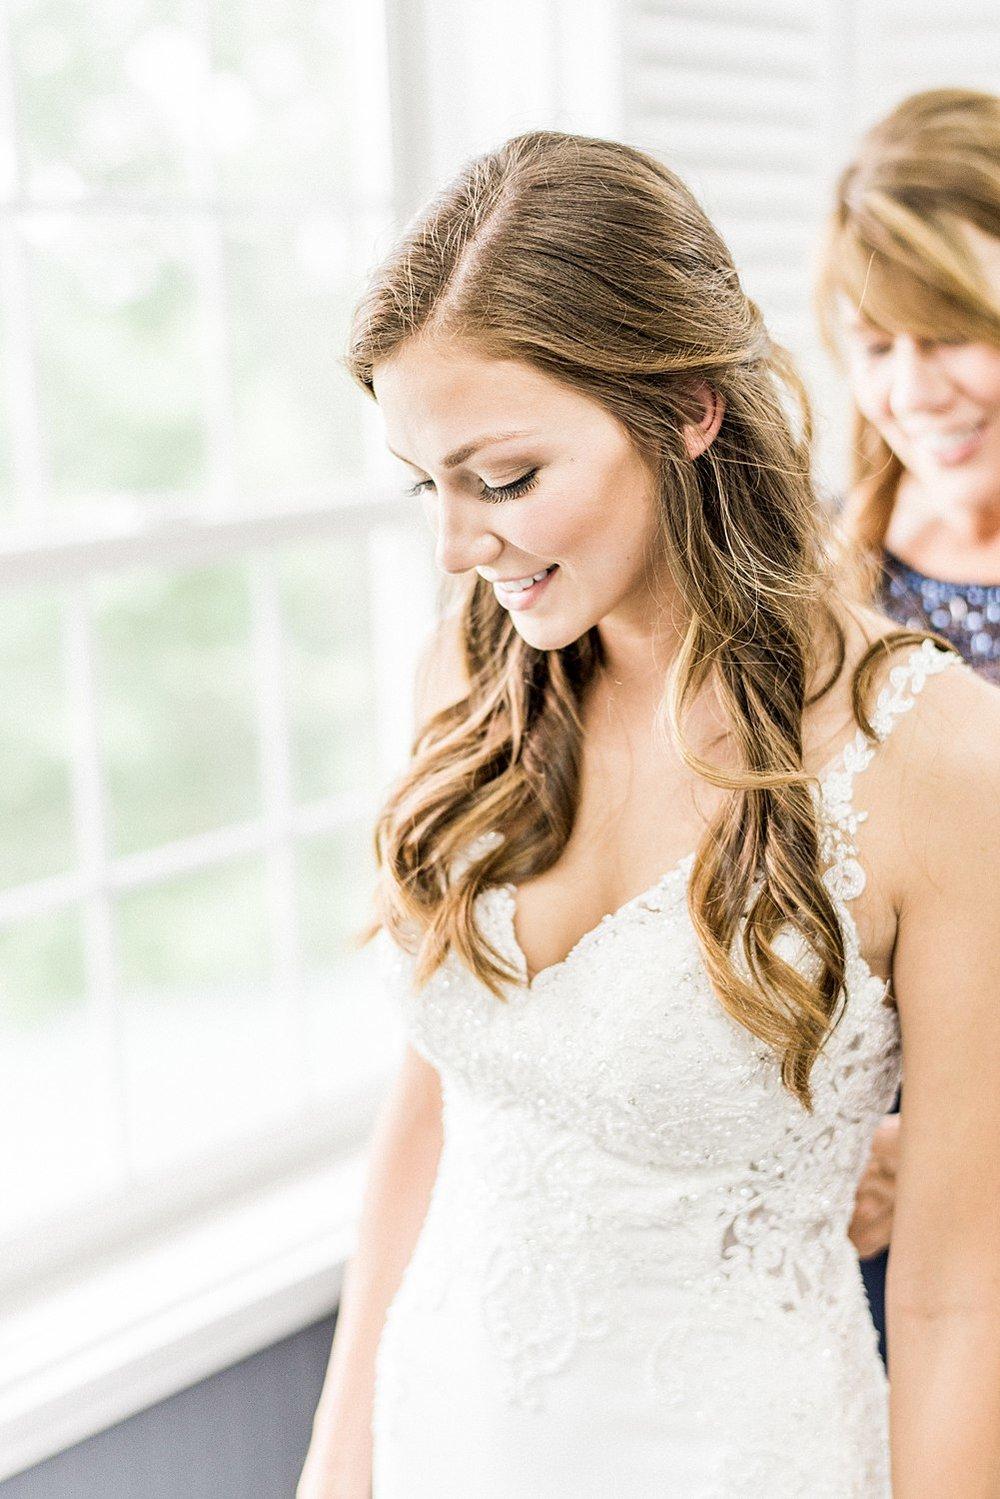 jessica & Andrew | walnut hill farm wedding | knoxville wedding photographer | juicebeats photography